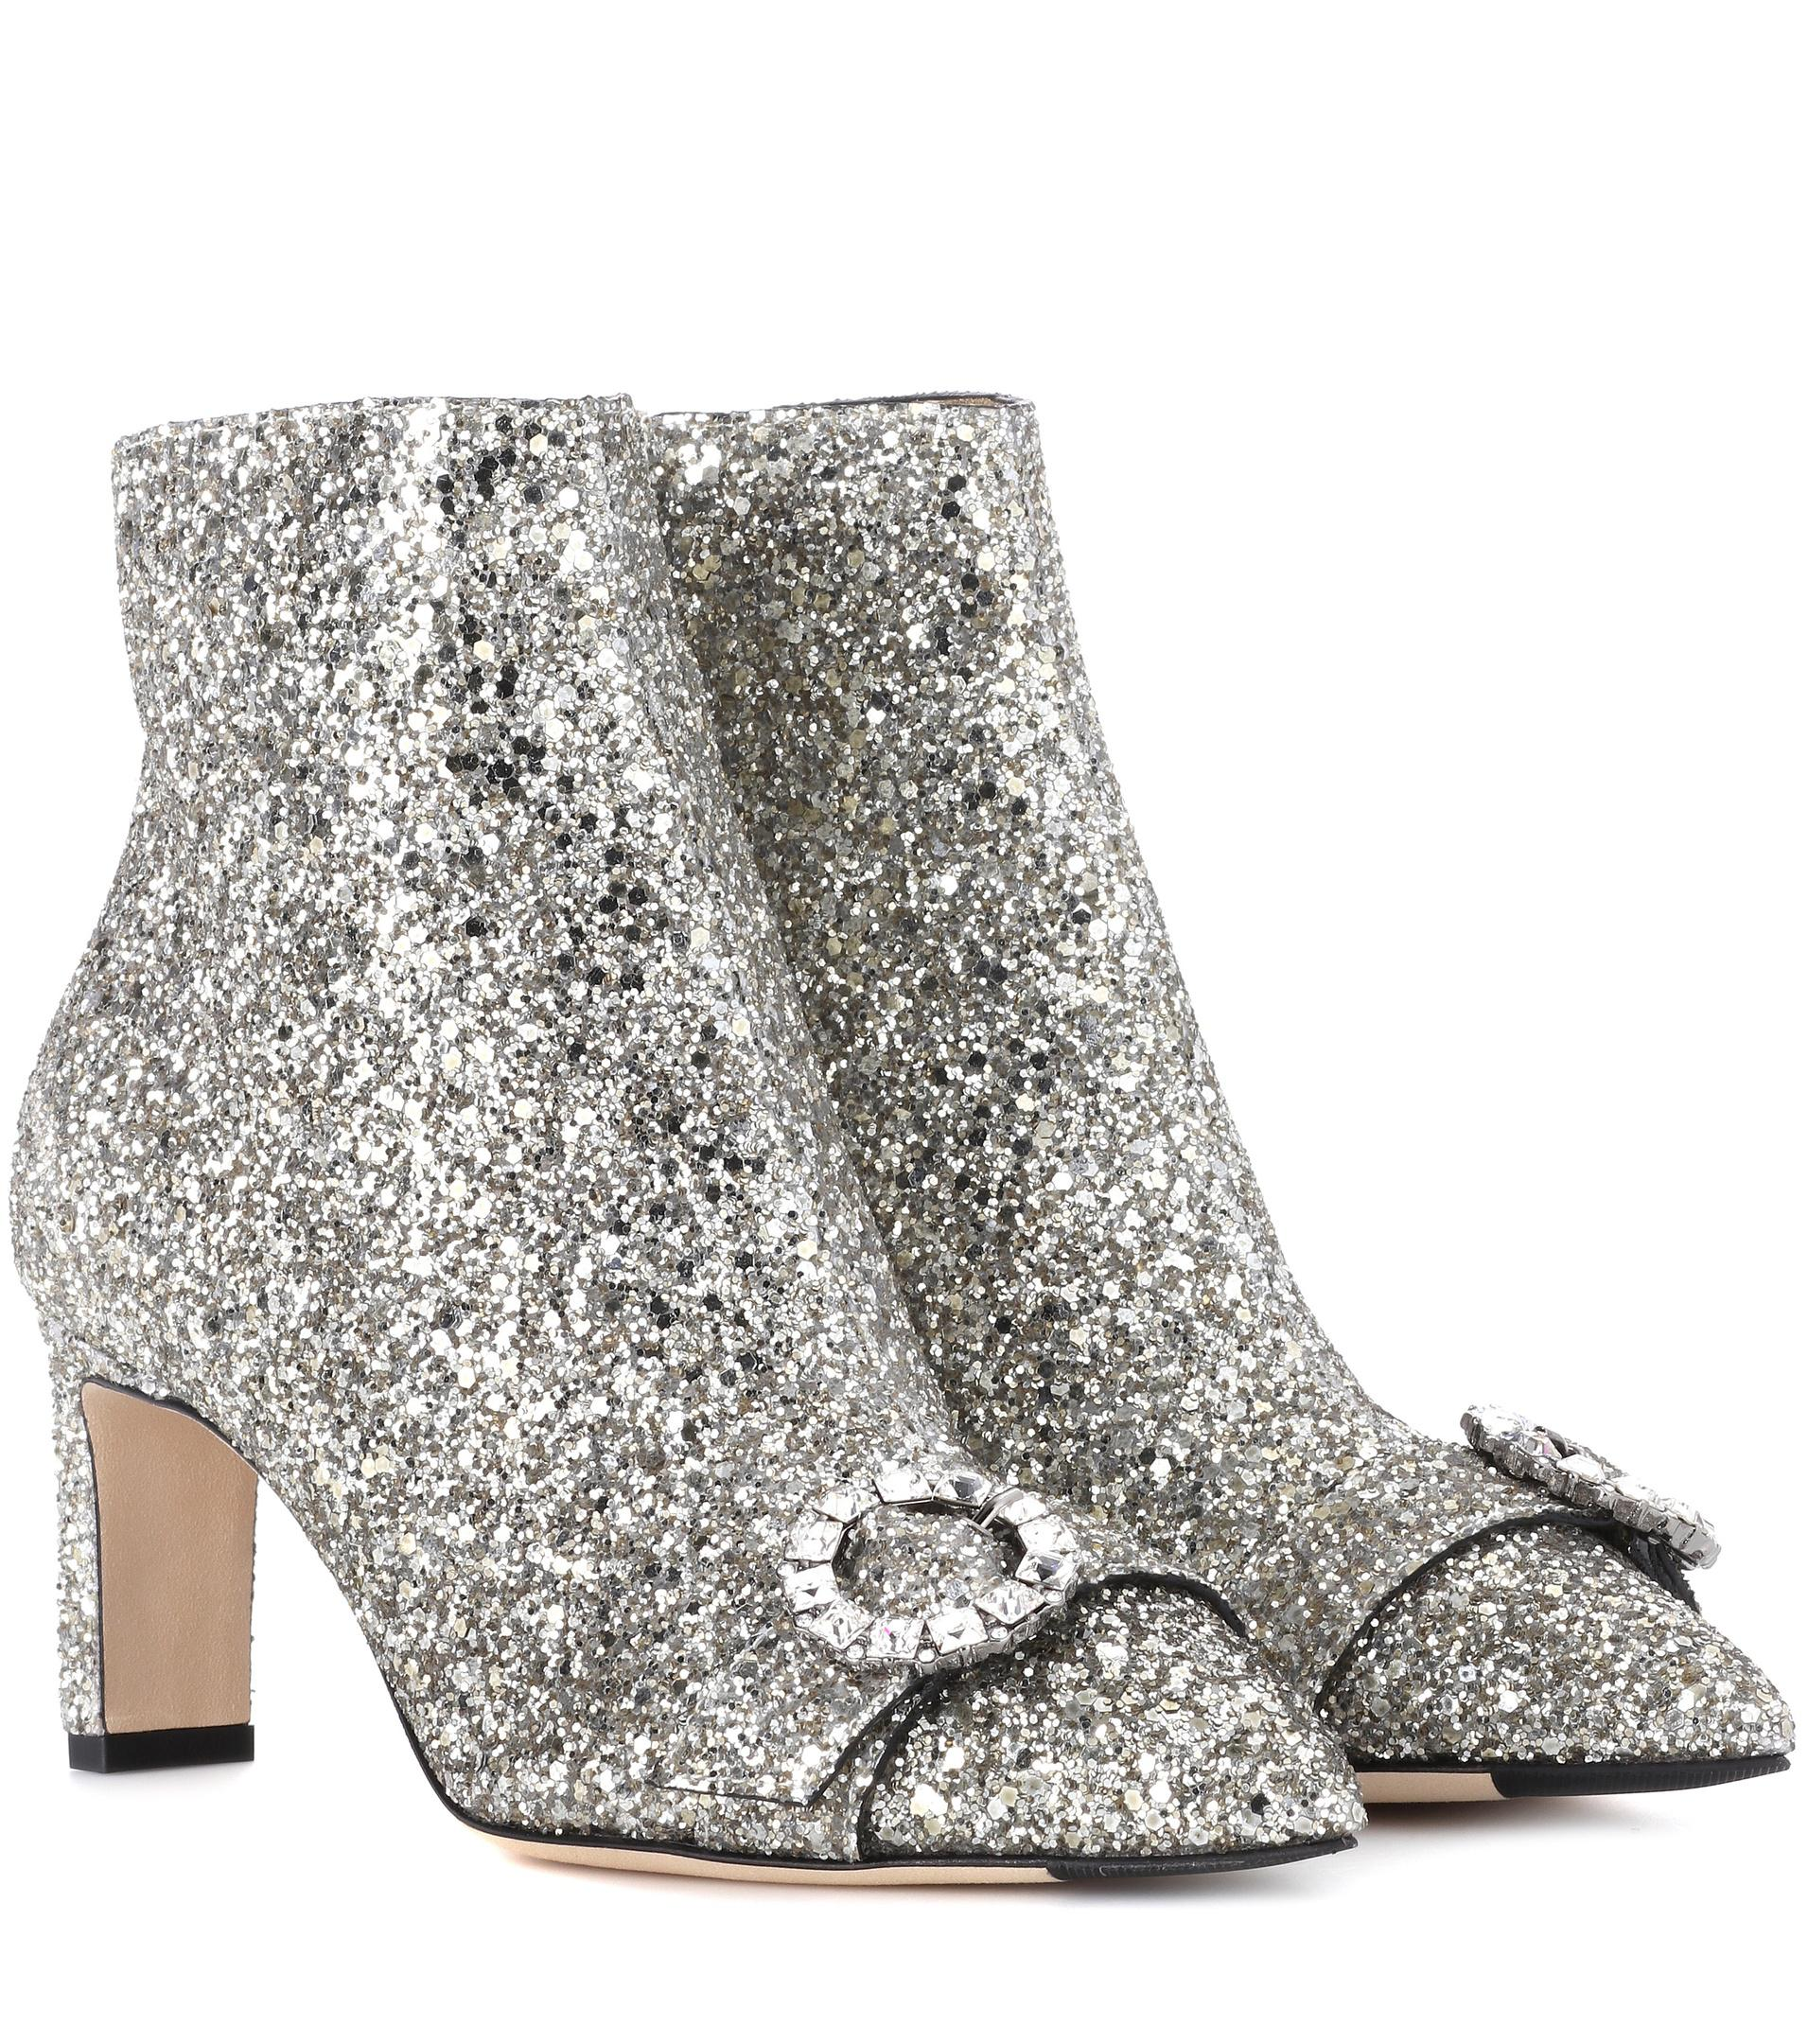 Jimmy Choo Hanover Glitter Ankle Boots